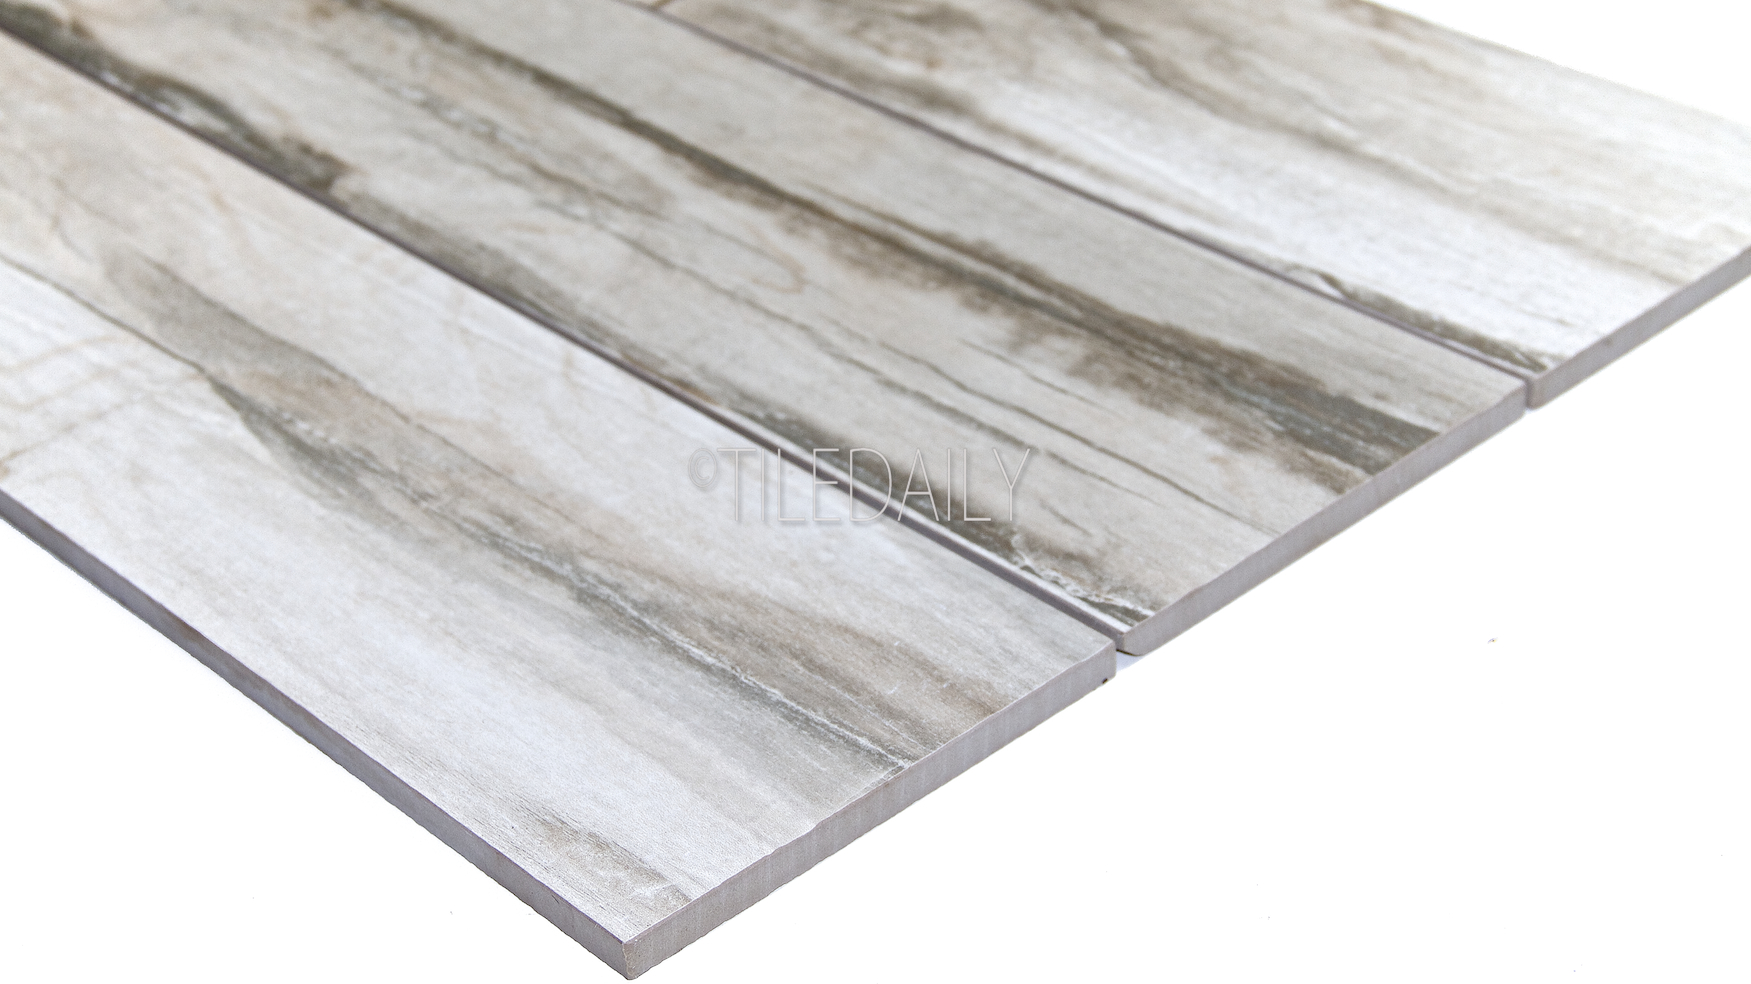 pw0023 6x36 cottage wood porcelain tile grey